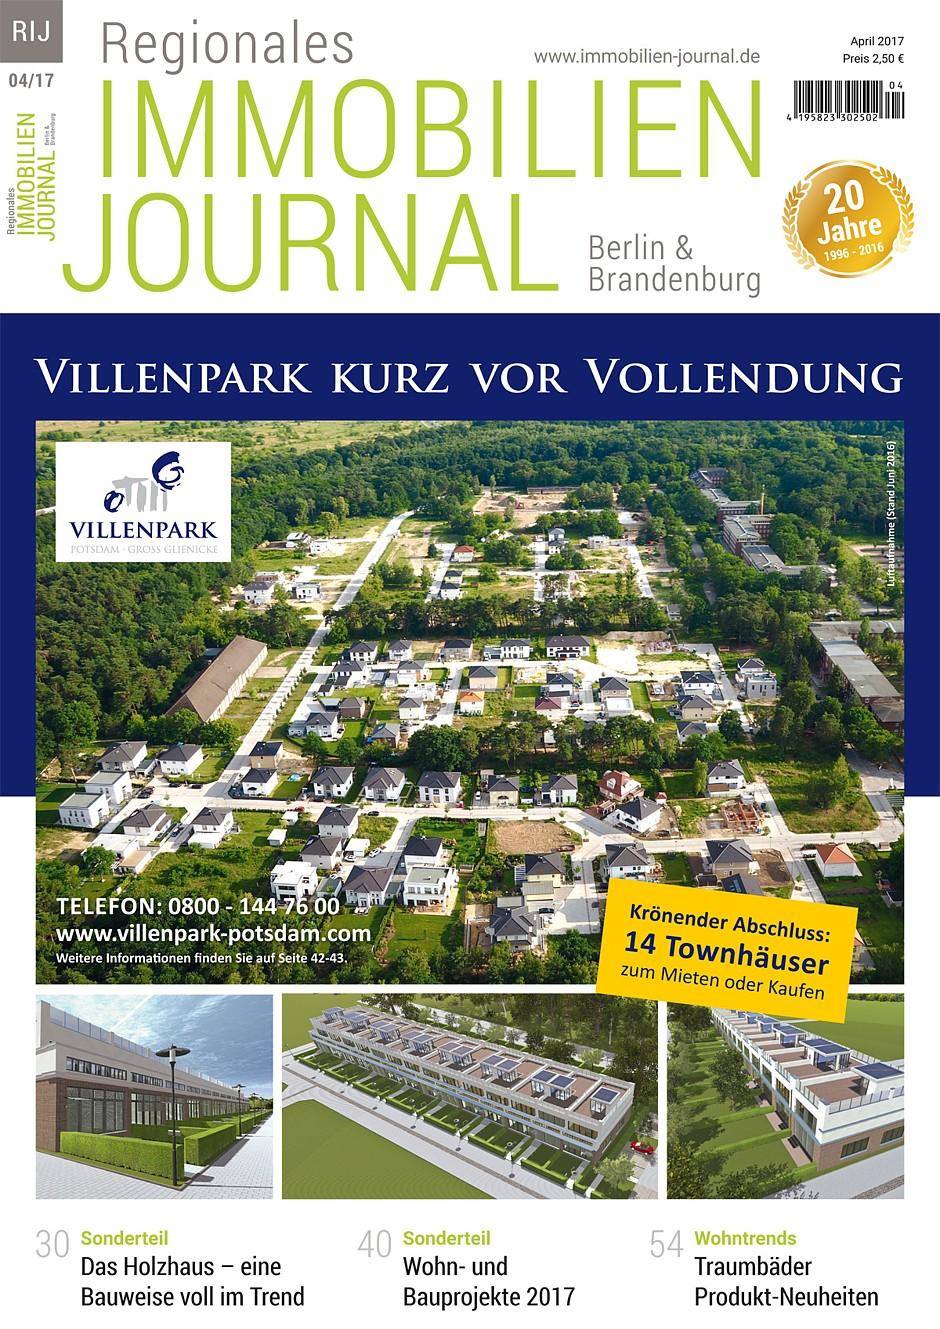 Regionales Immobilien Journal Berlin & Brandenburg April 2017